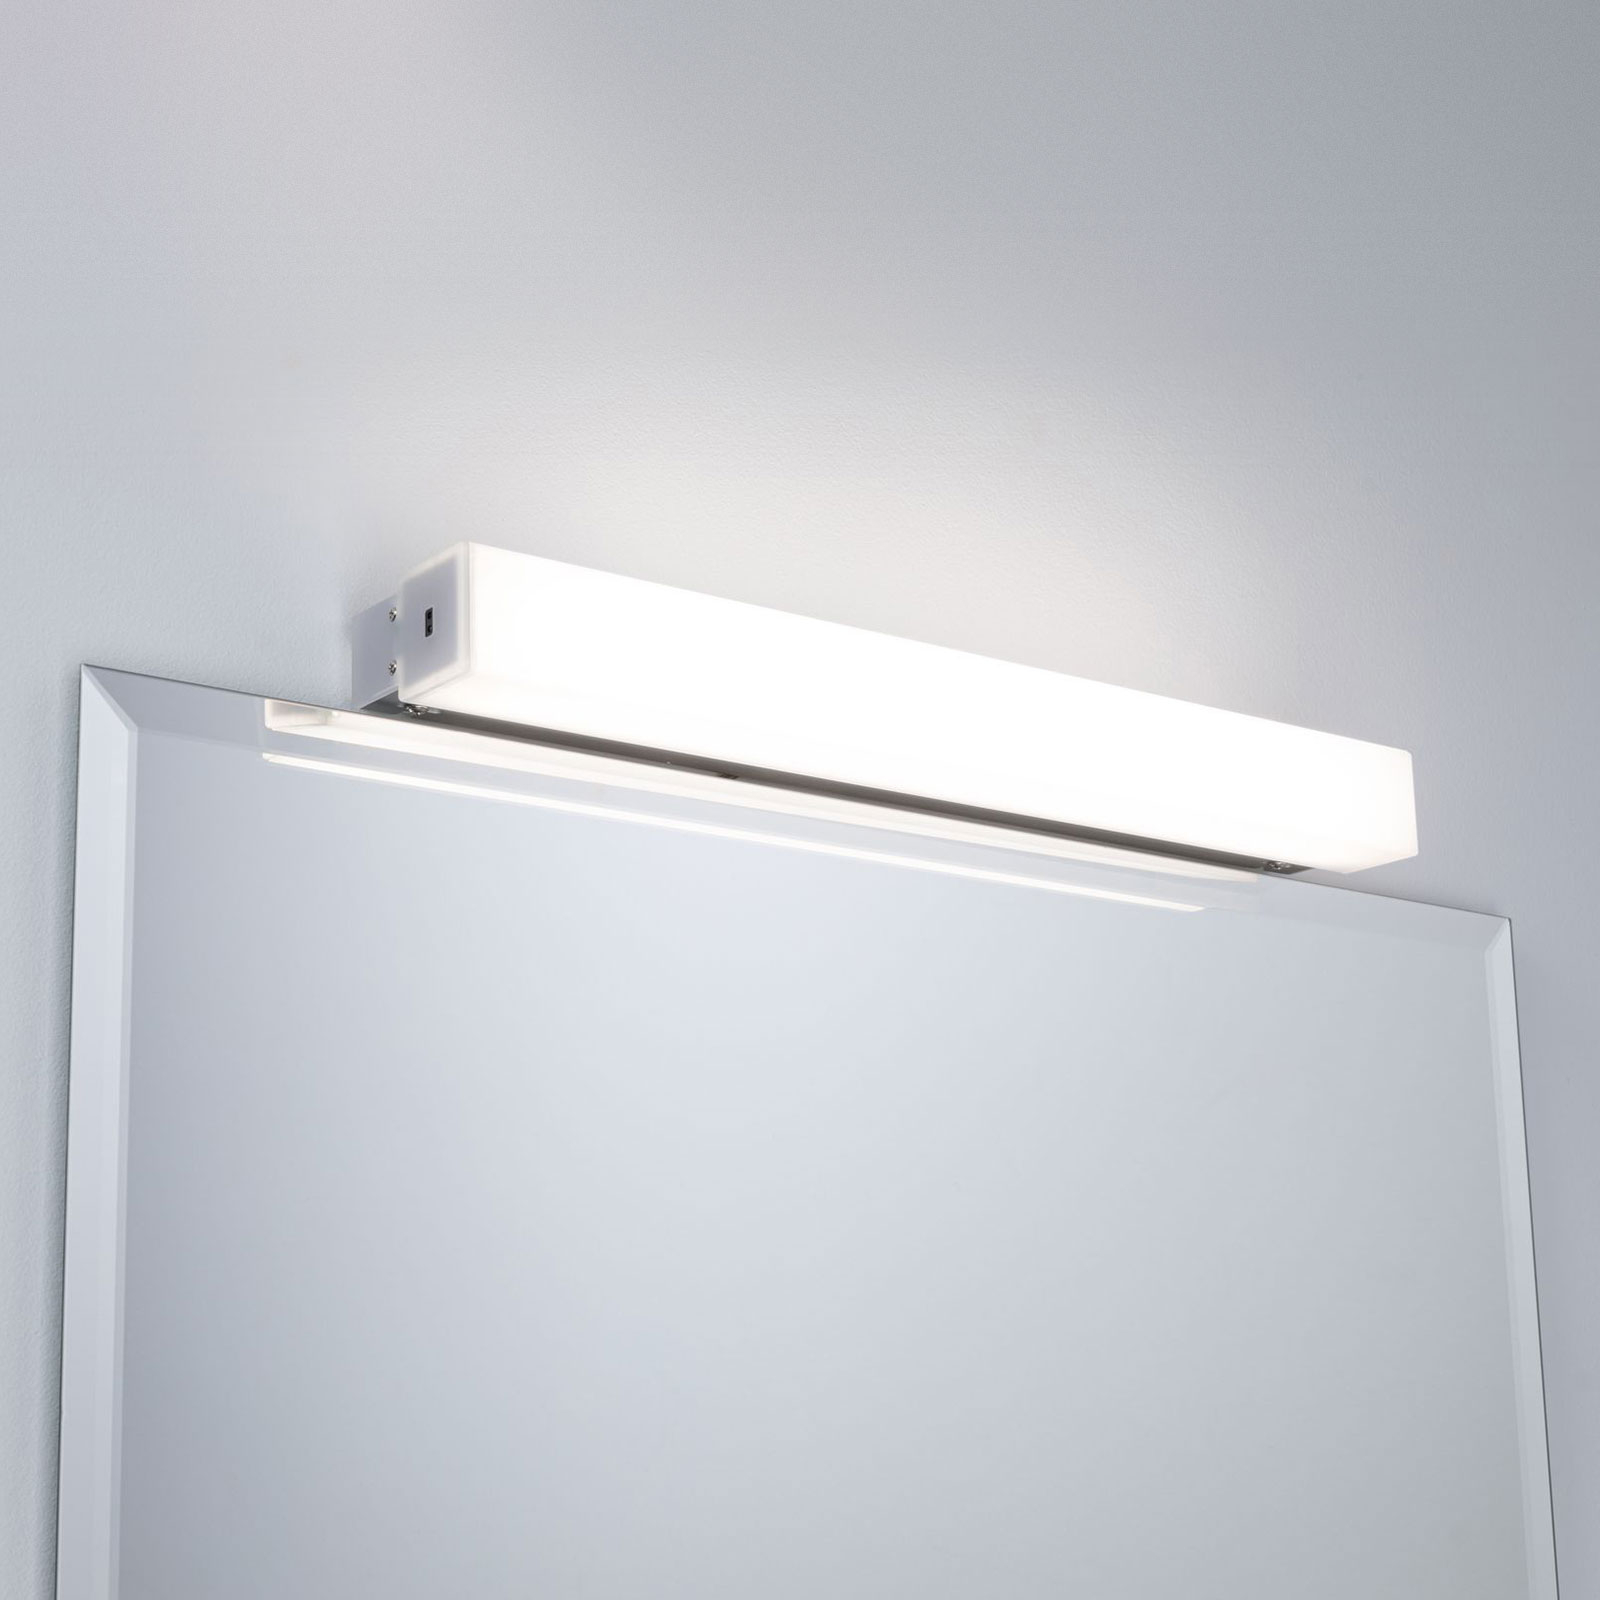 Paulmann HomeSpa Luno LED-spegellampa, 40 cm